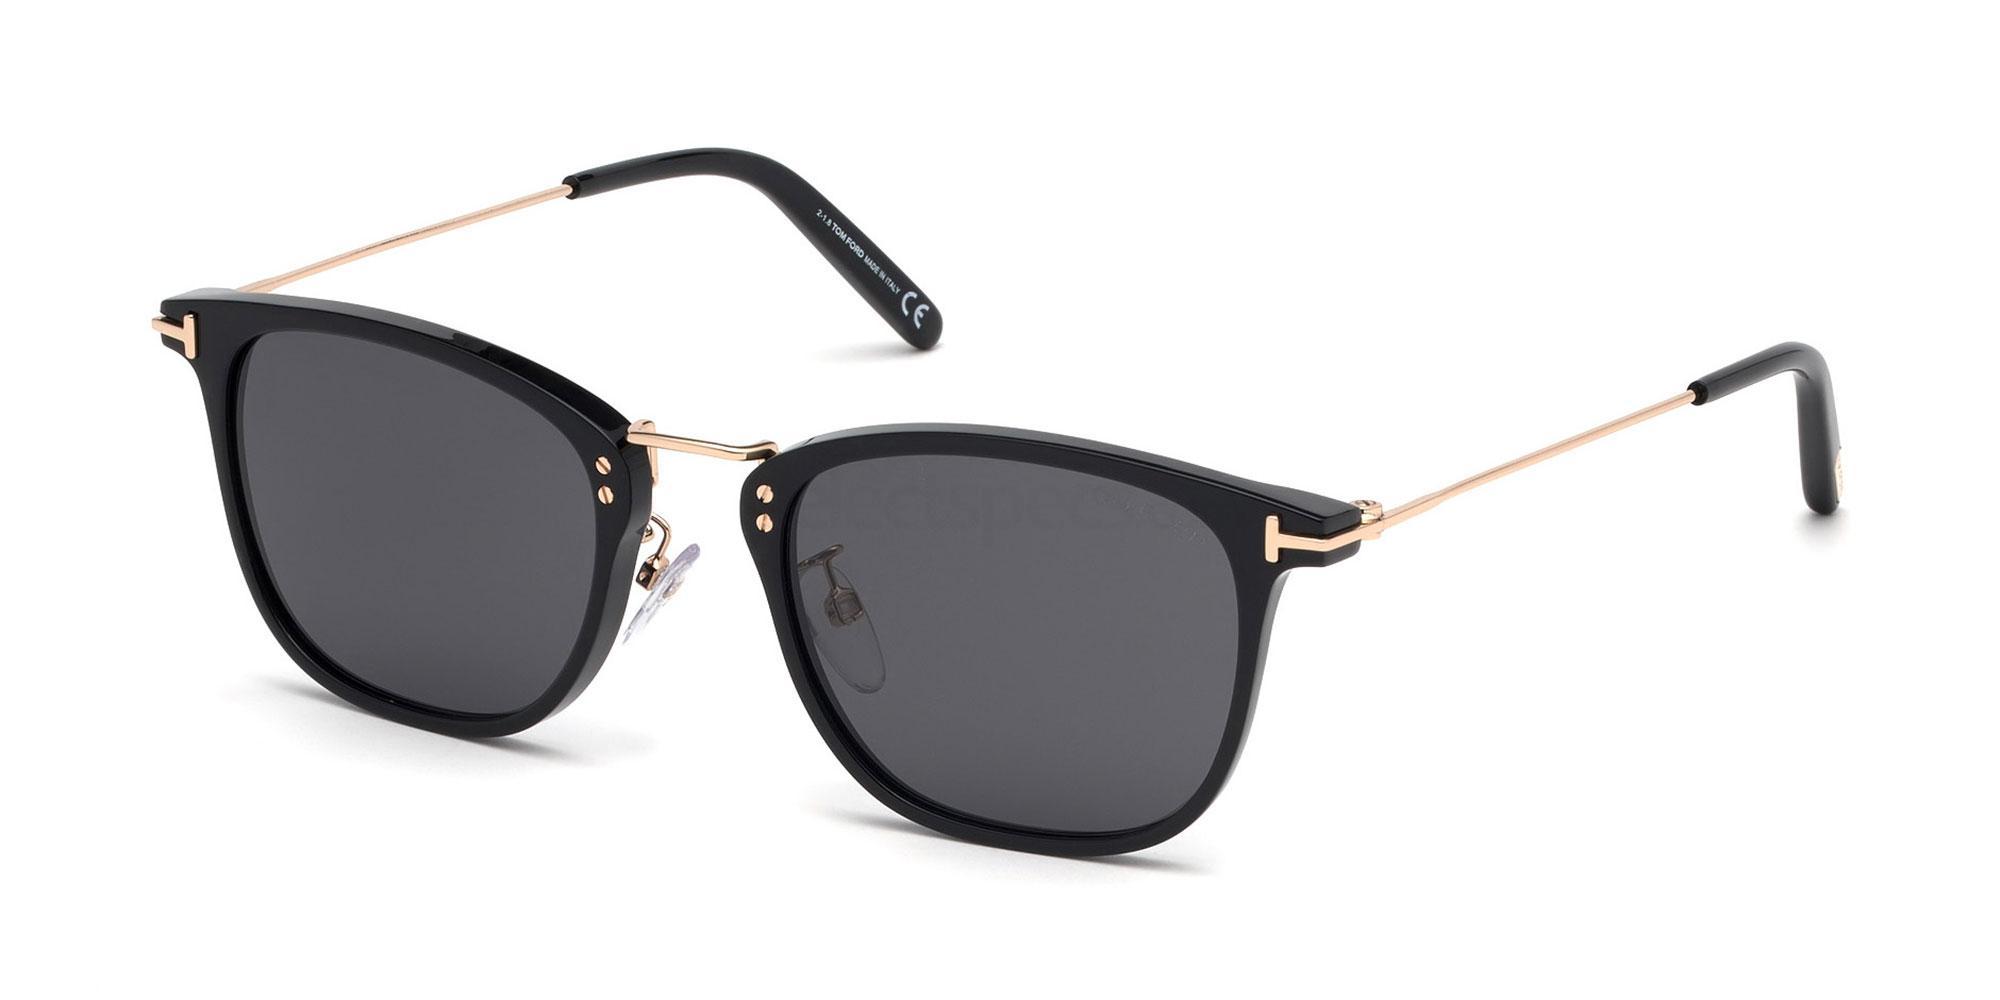 01A FT0672 Sunglasses, Tom Ford